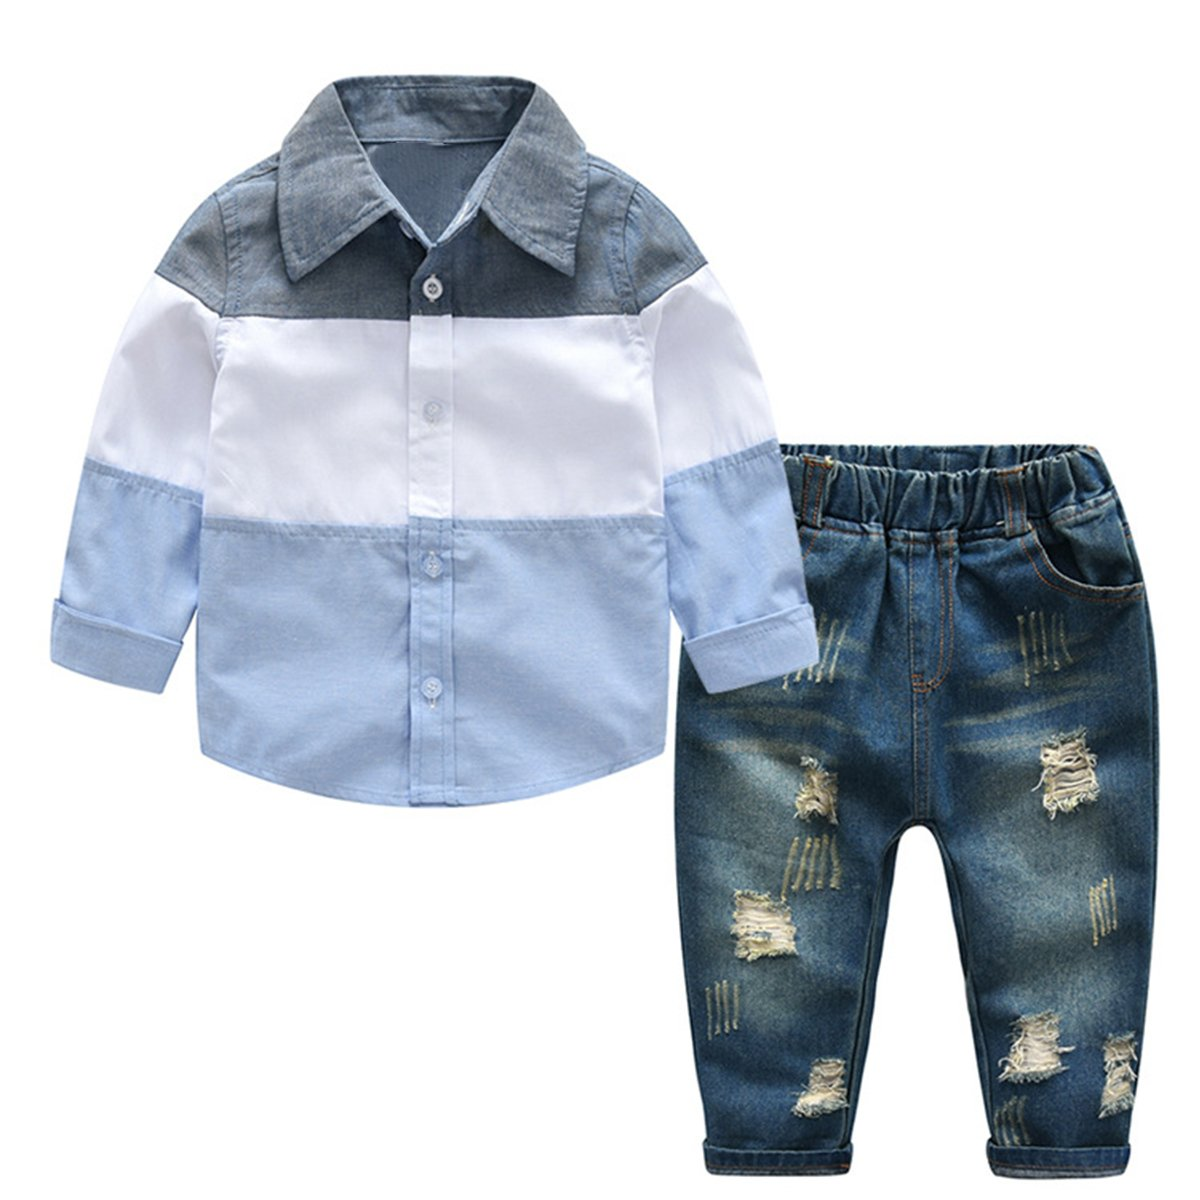 2-7T Kids Boys Gentleman Outfits Stripe Shirt Tops Denim Pants Jeans Clothes Set (4T, Light Blue+Grey)